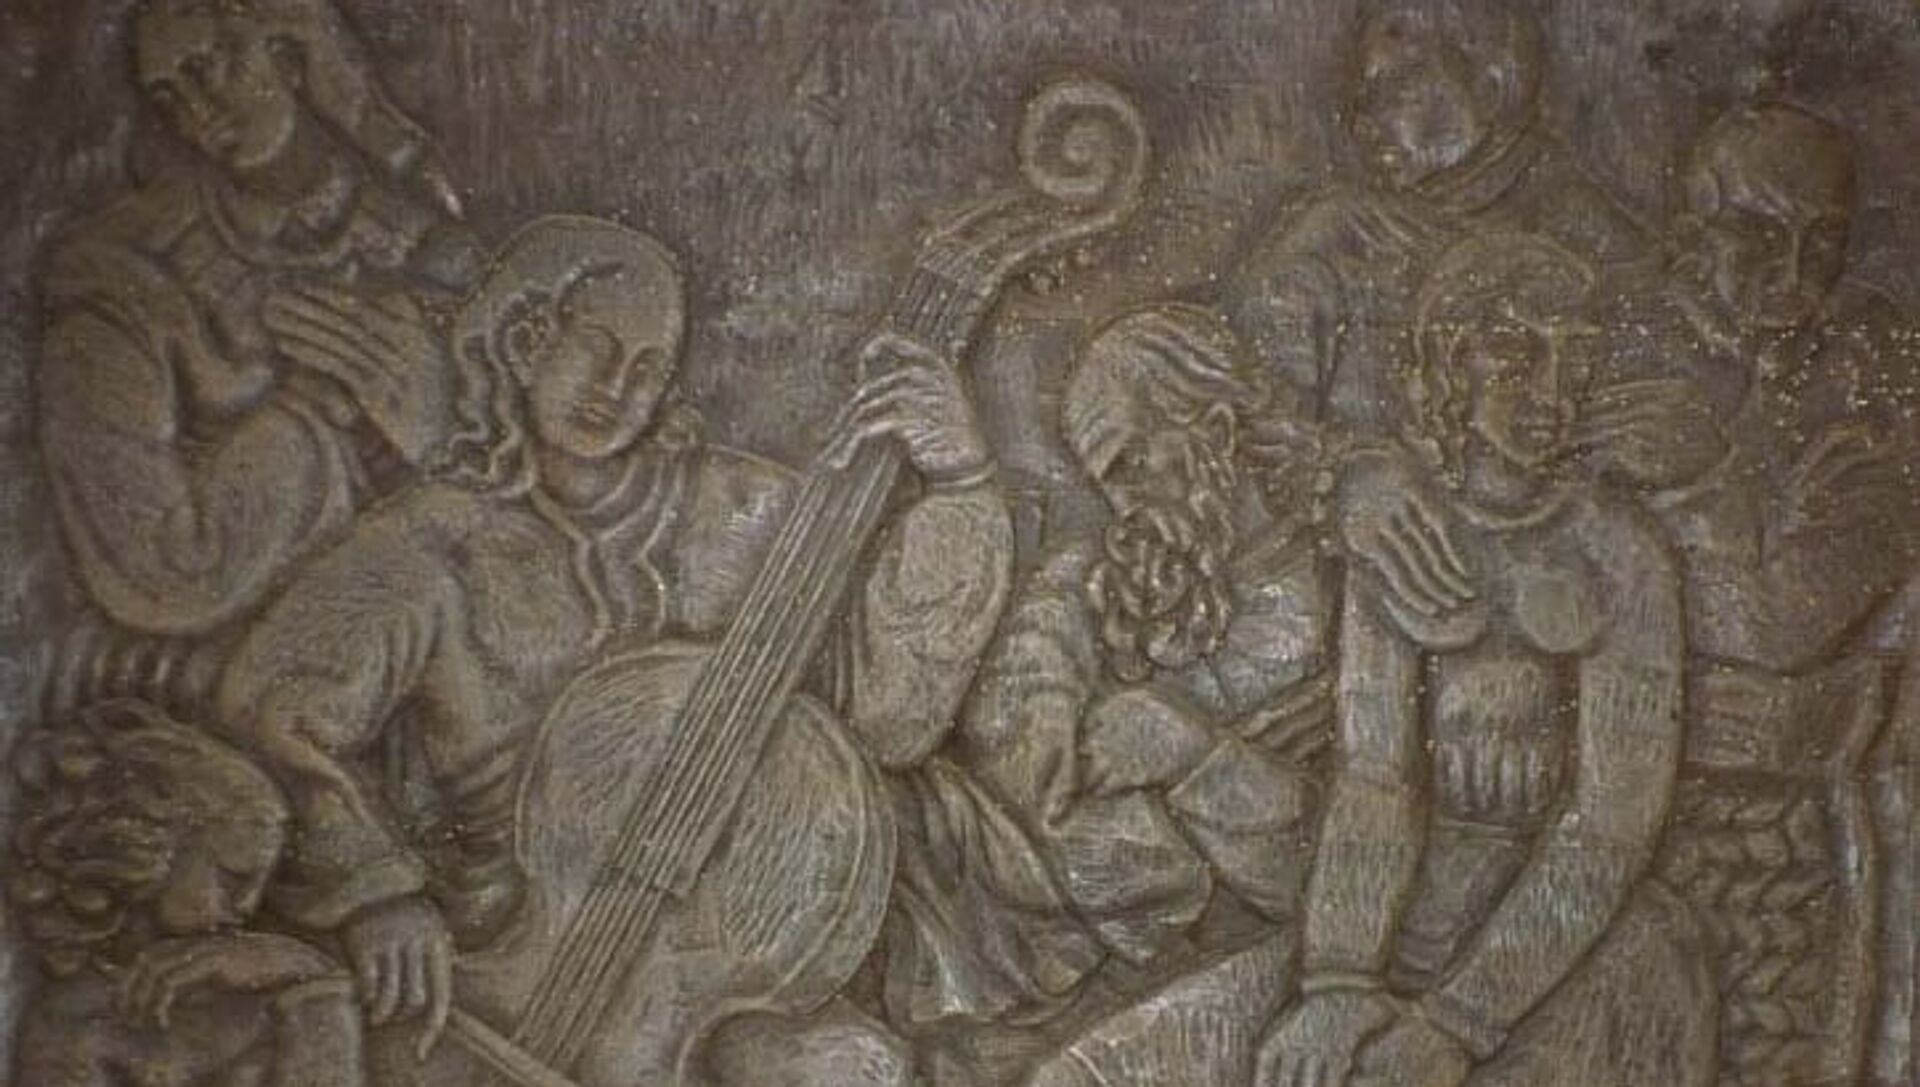 Сретен Стојановић, Домаћа музика, 1931. Музеј града Београда - Sputnik Србија, 1920, 12.02.2021